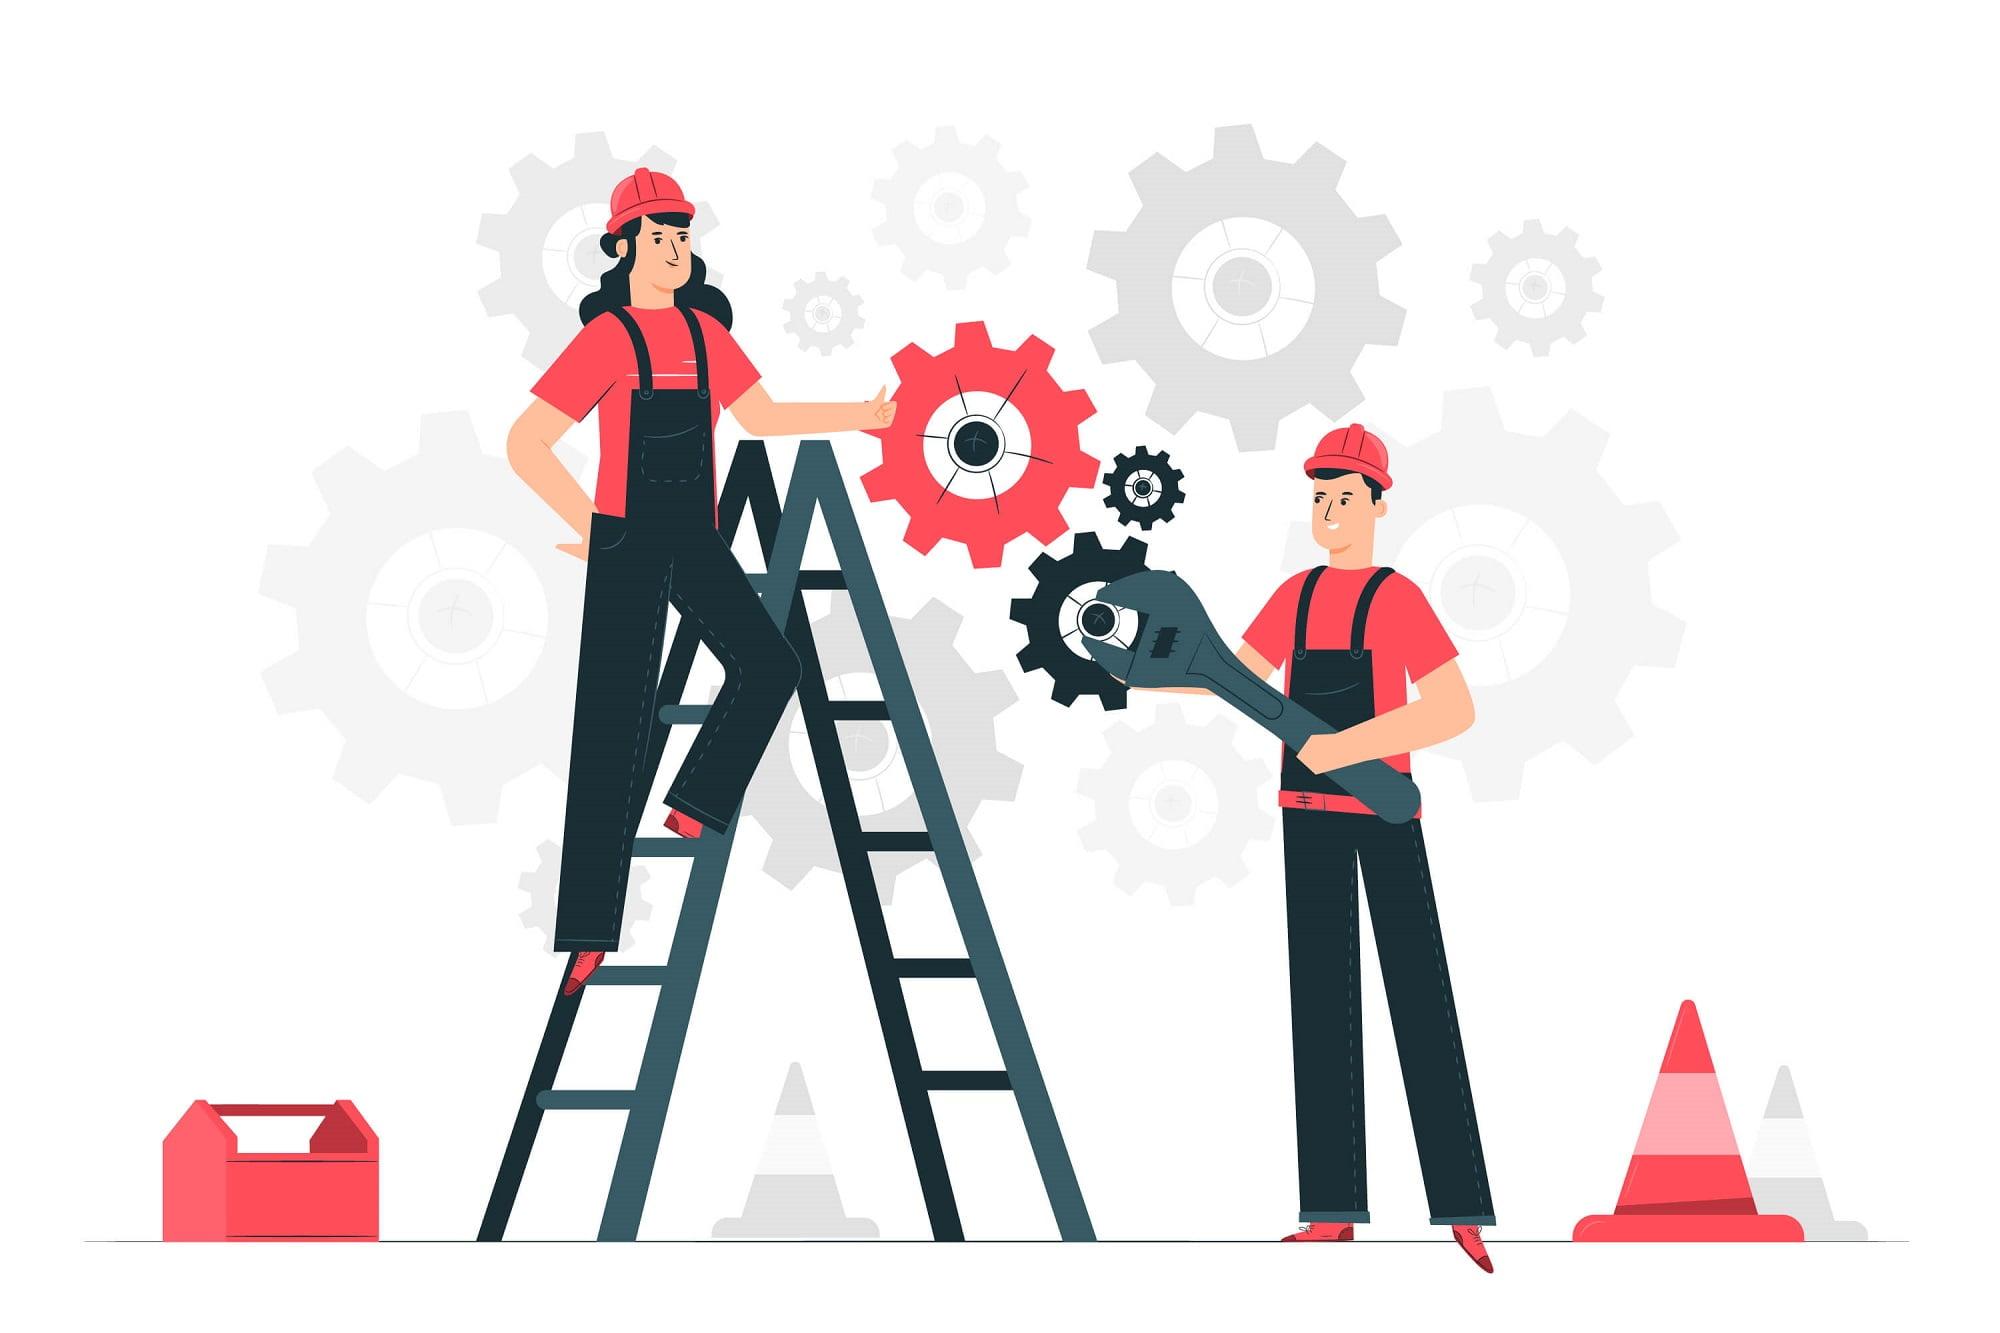 Project maintenance